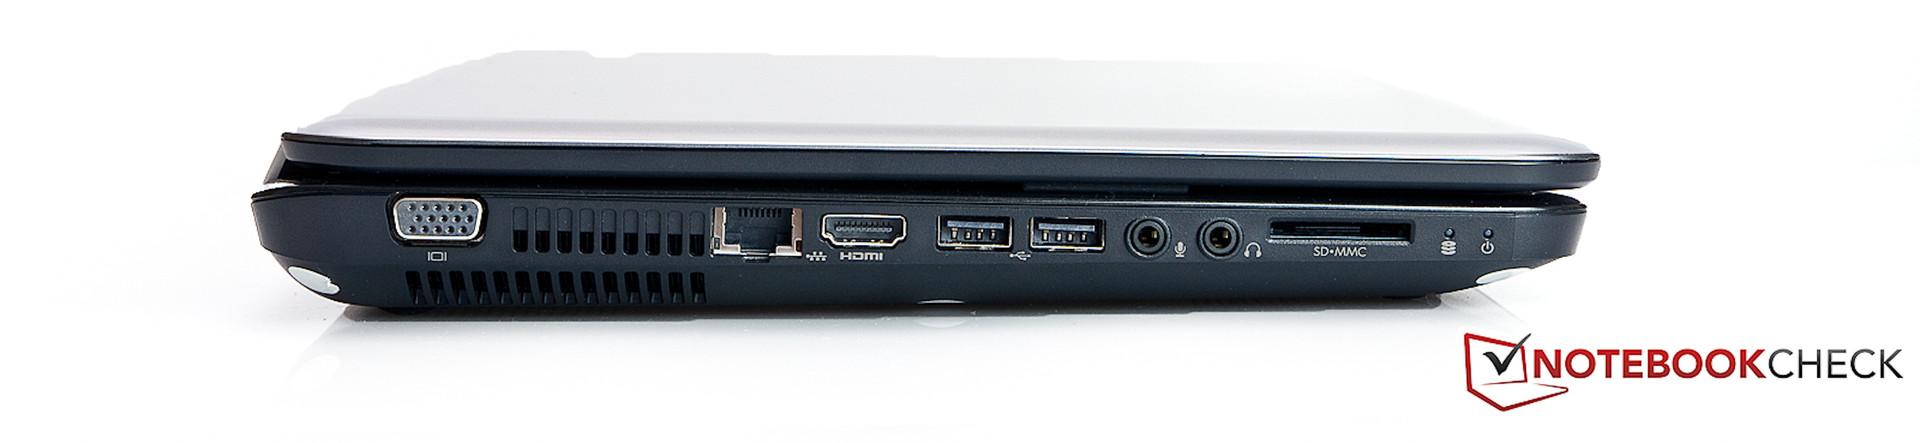 HP PAVILION G6 USB3 DRIVER FOR WINDOWS 7